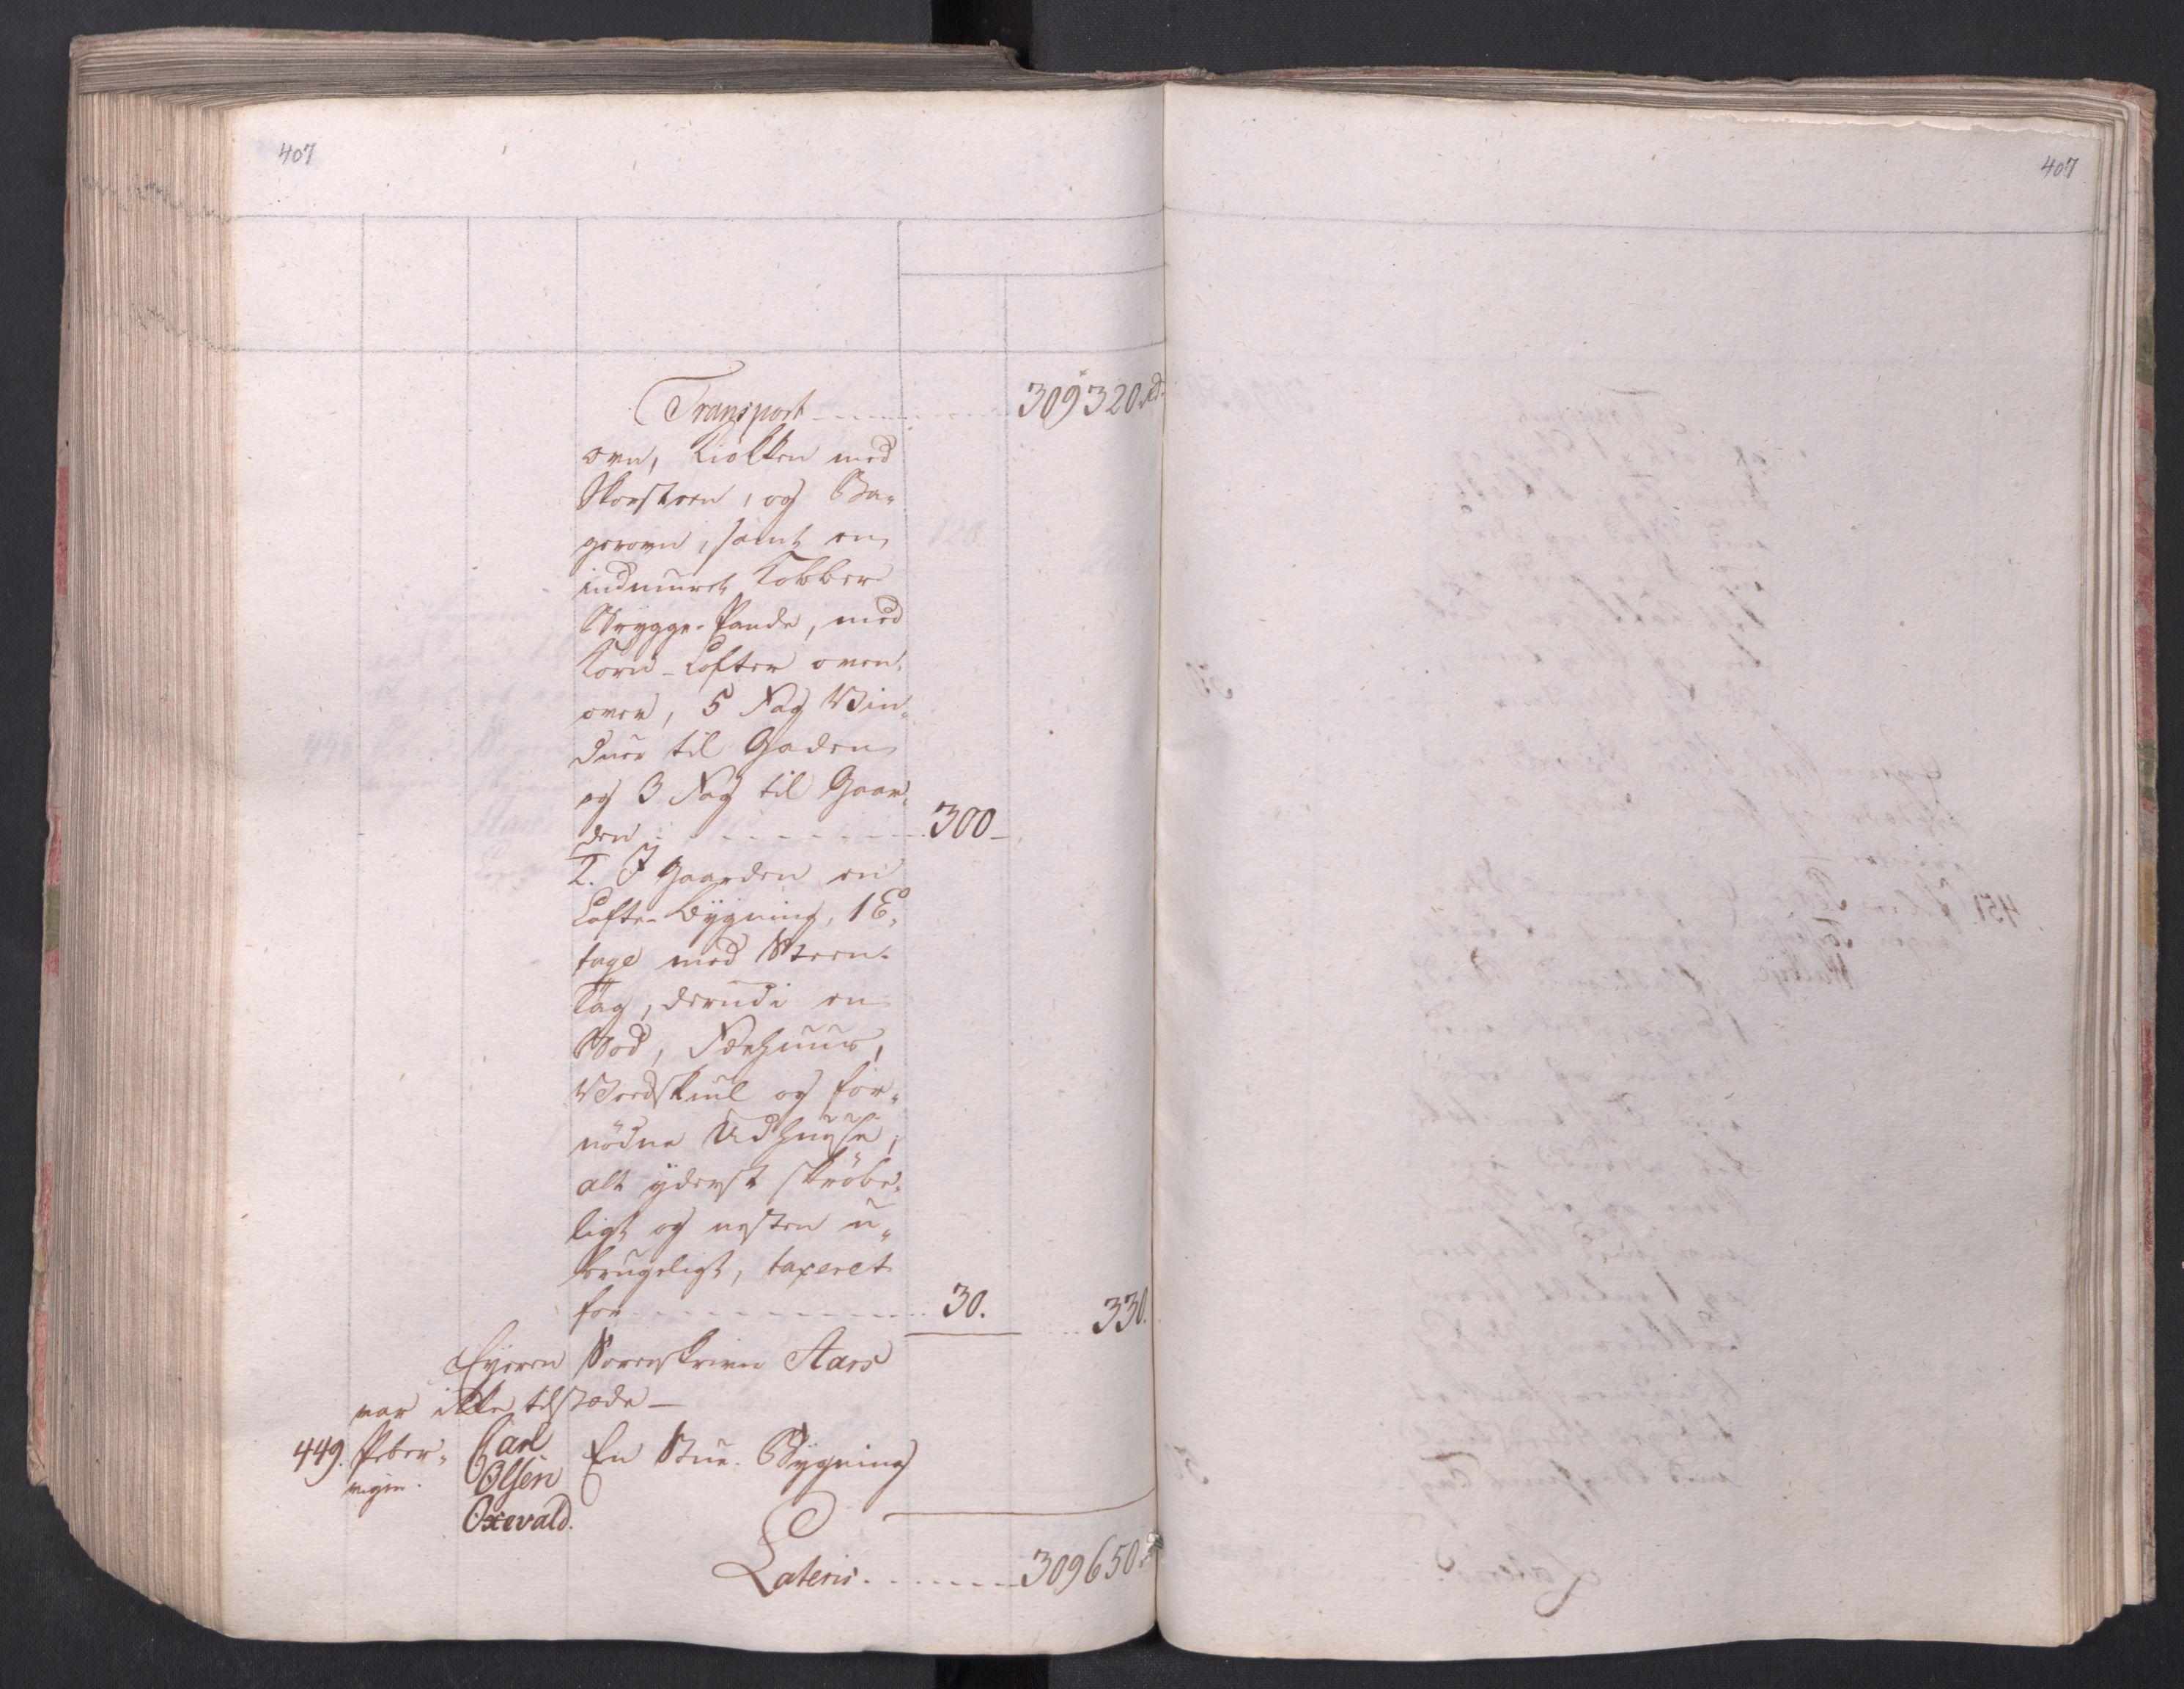 SAO, Kristiania stiftamt, I/Ia/L0015: Branntakster, 1797, s. 407